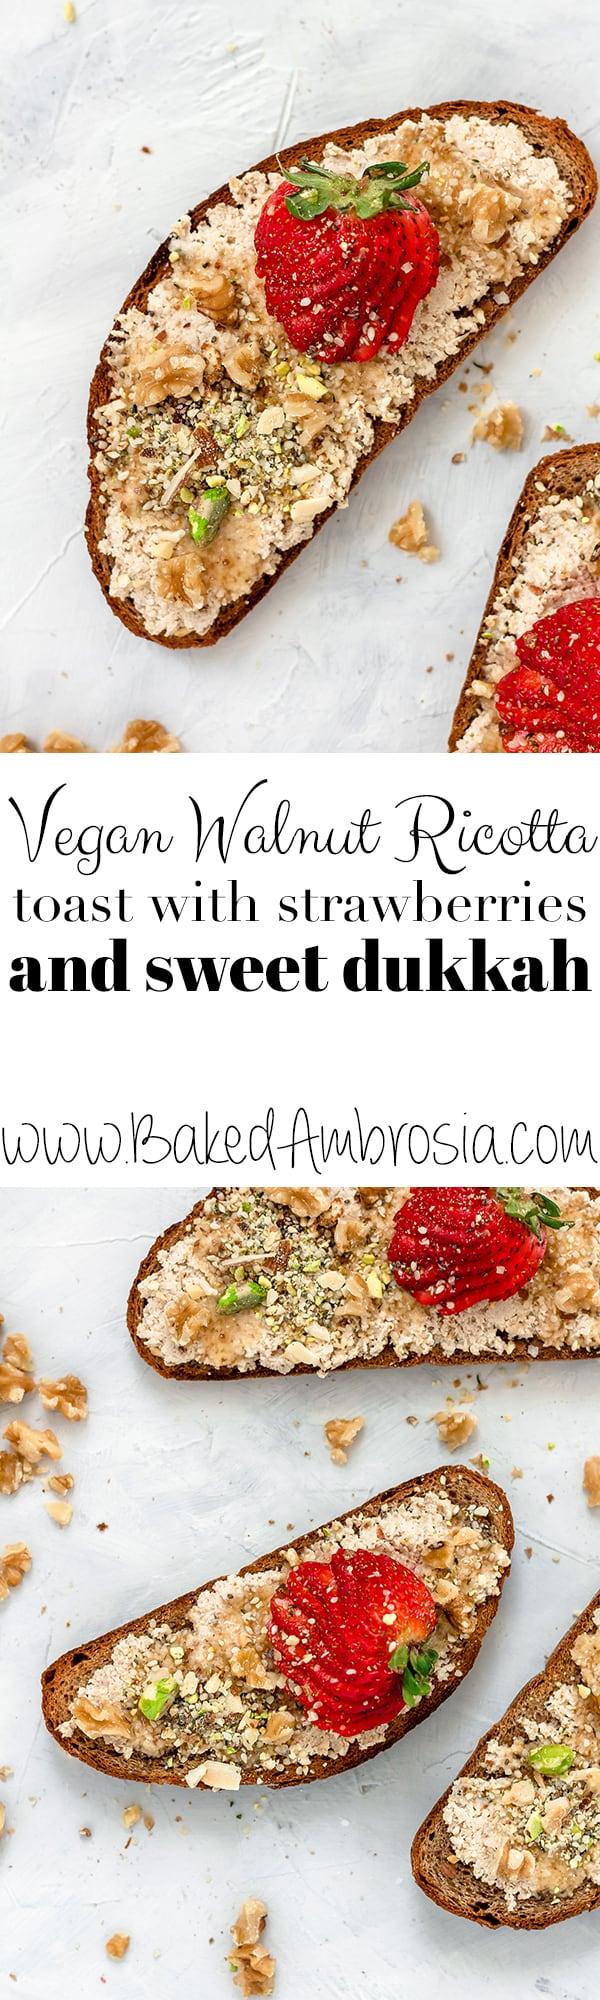 Vegan Walnut Ricotta Toast with Strawberries and Sweet Dukkah